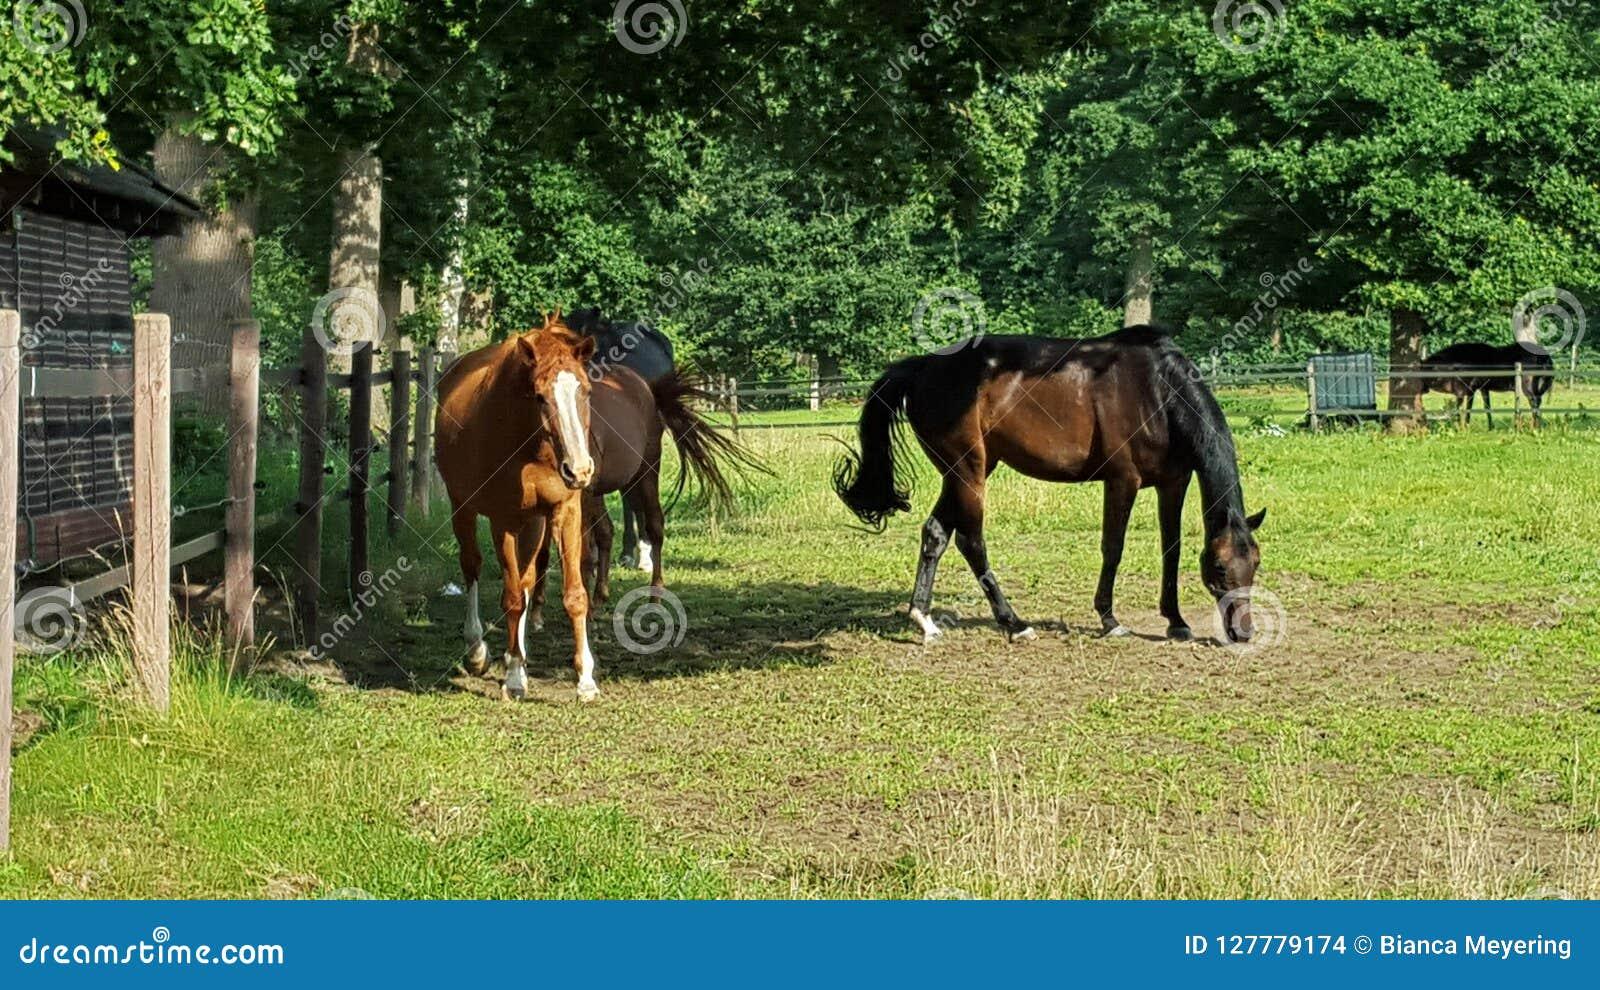 Three horses on a pasture feeding grass